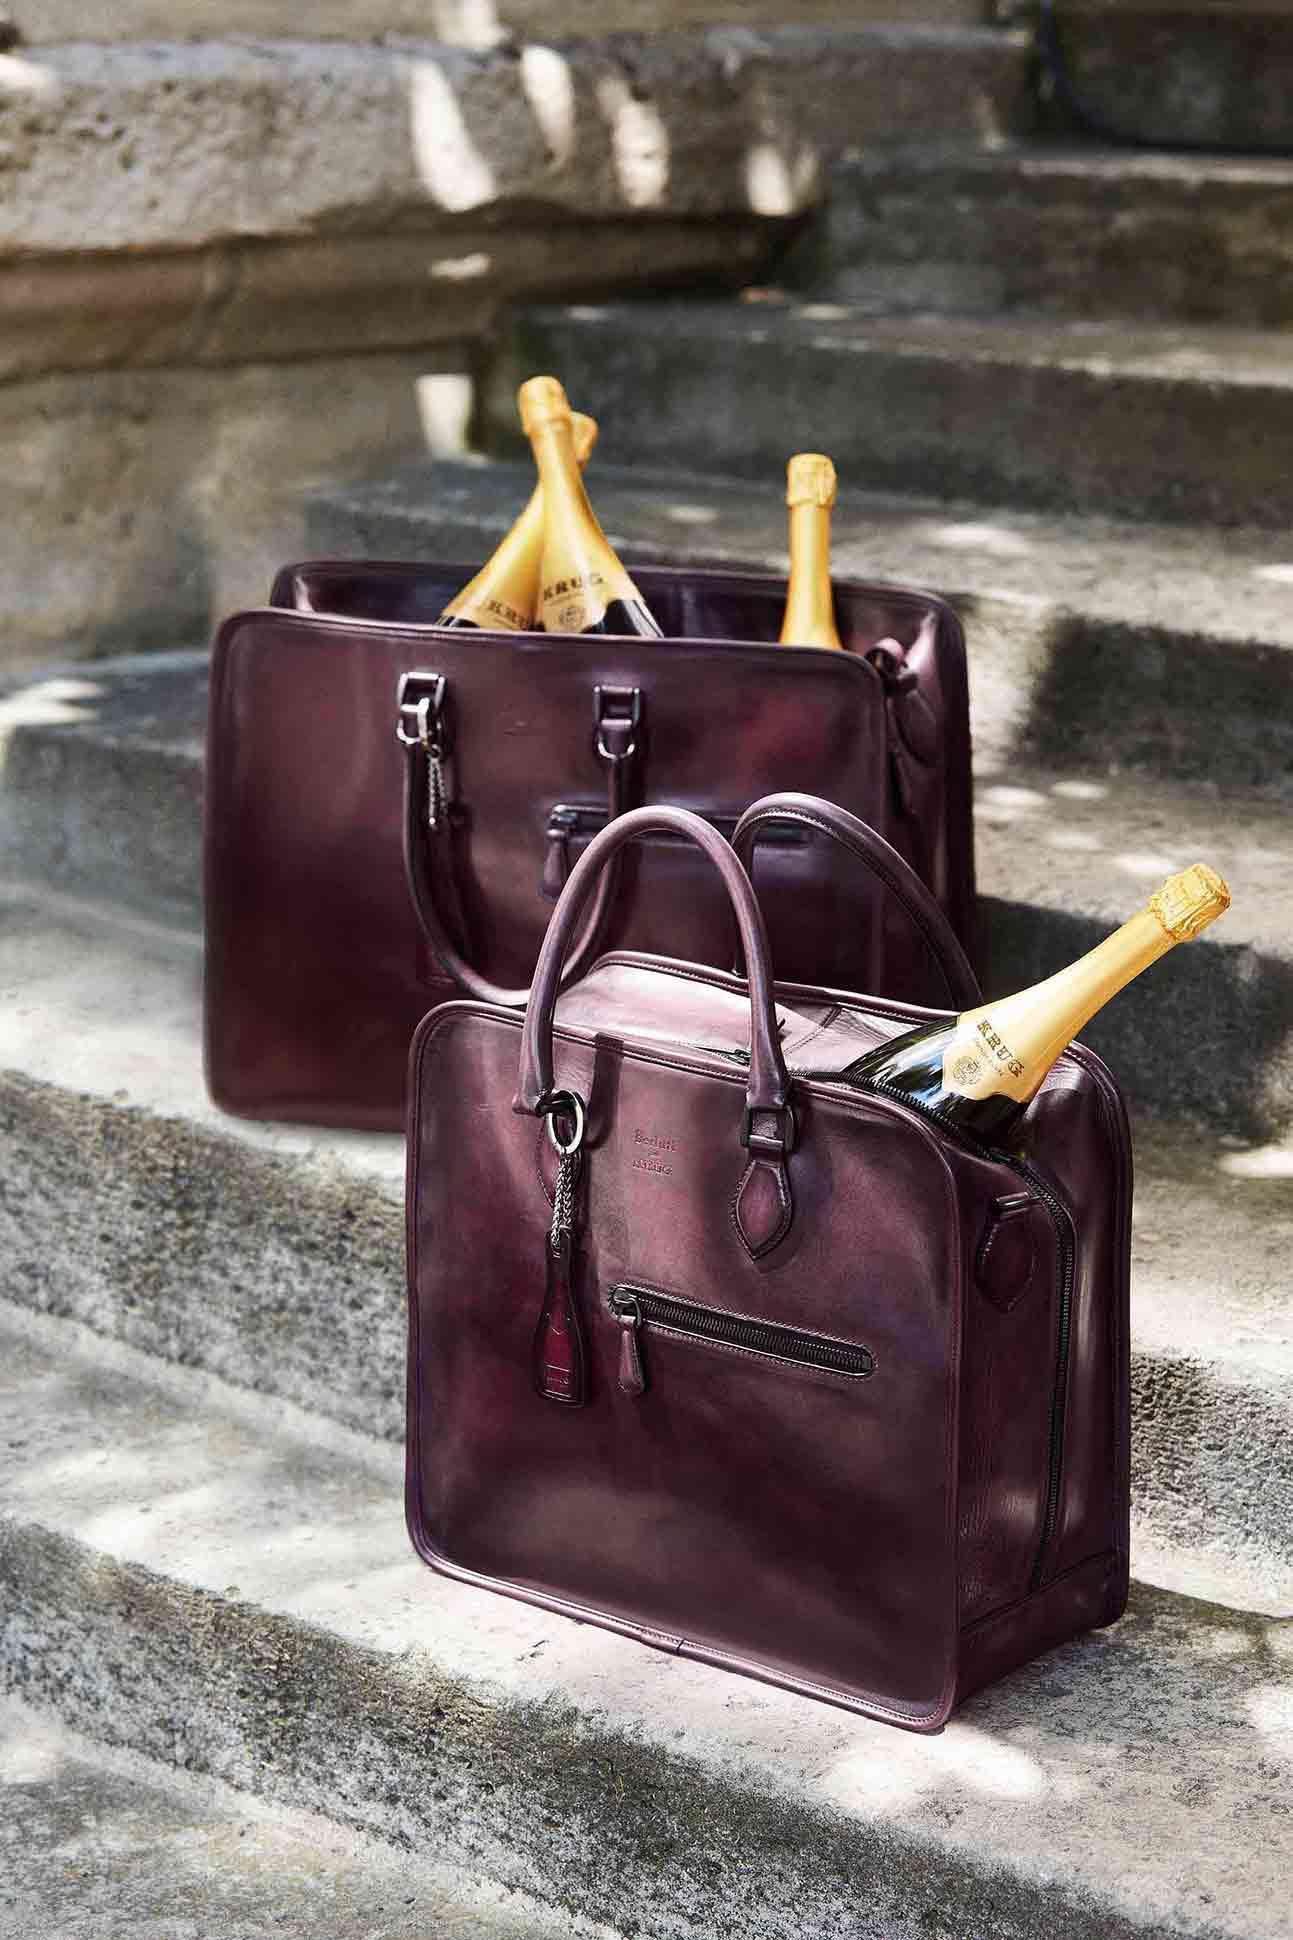 Berlutti pour Krug bag